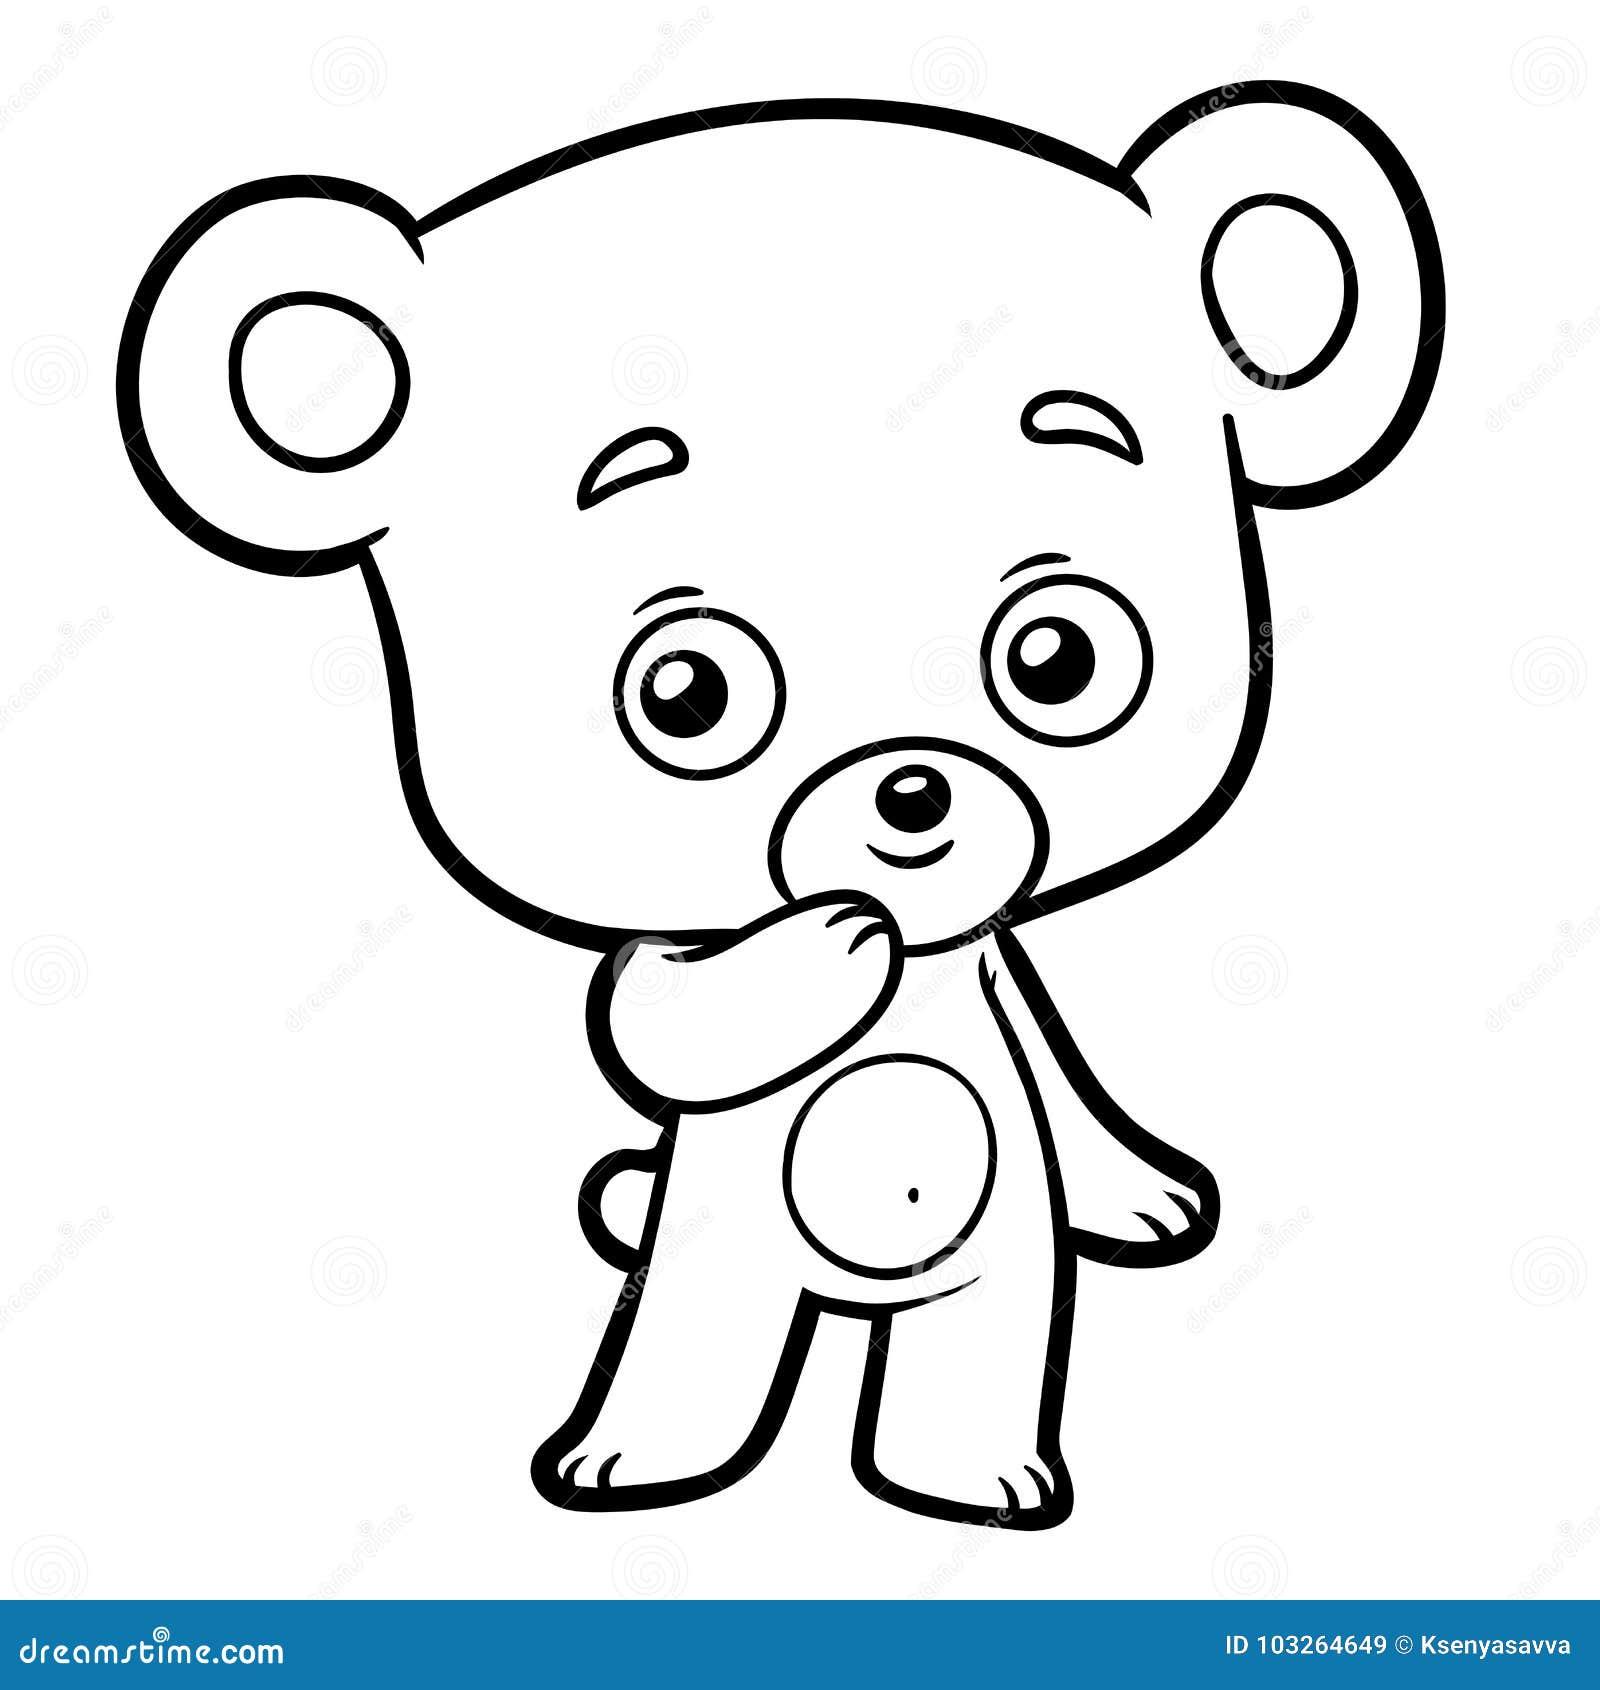 Großzügig Teddybär Malbuch Ideen - Druckbare Malvorlagen - amaichi.info